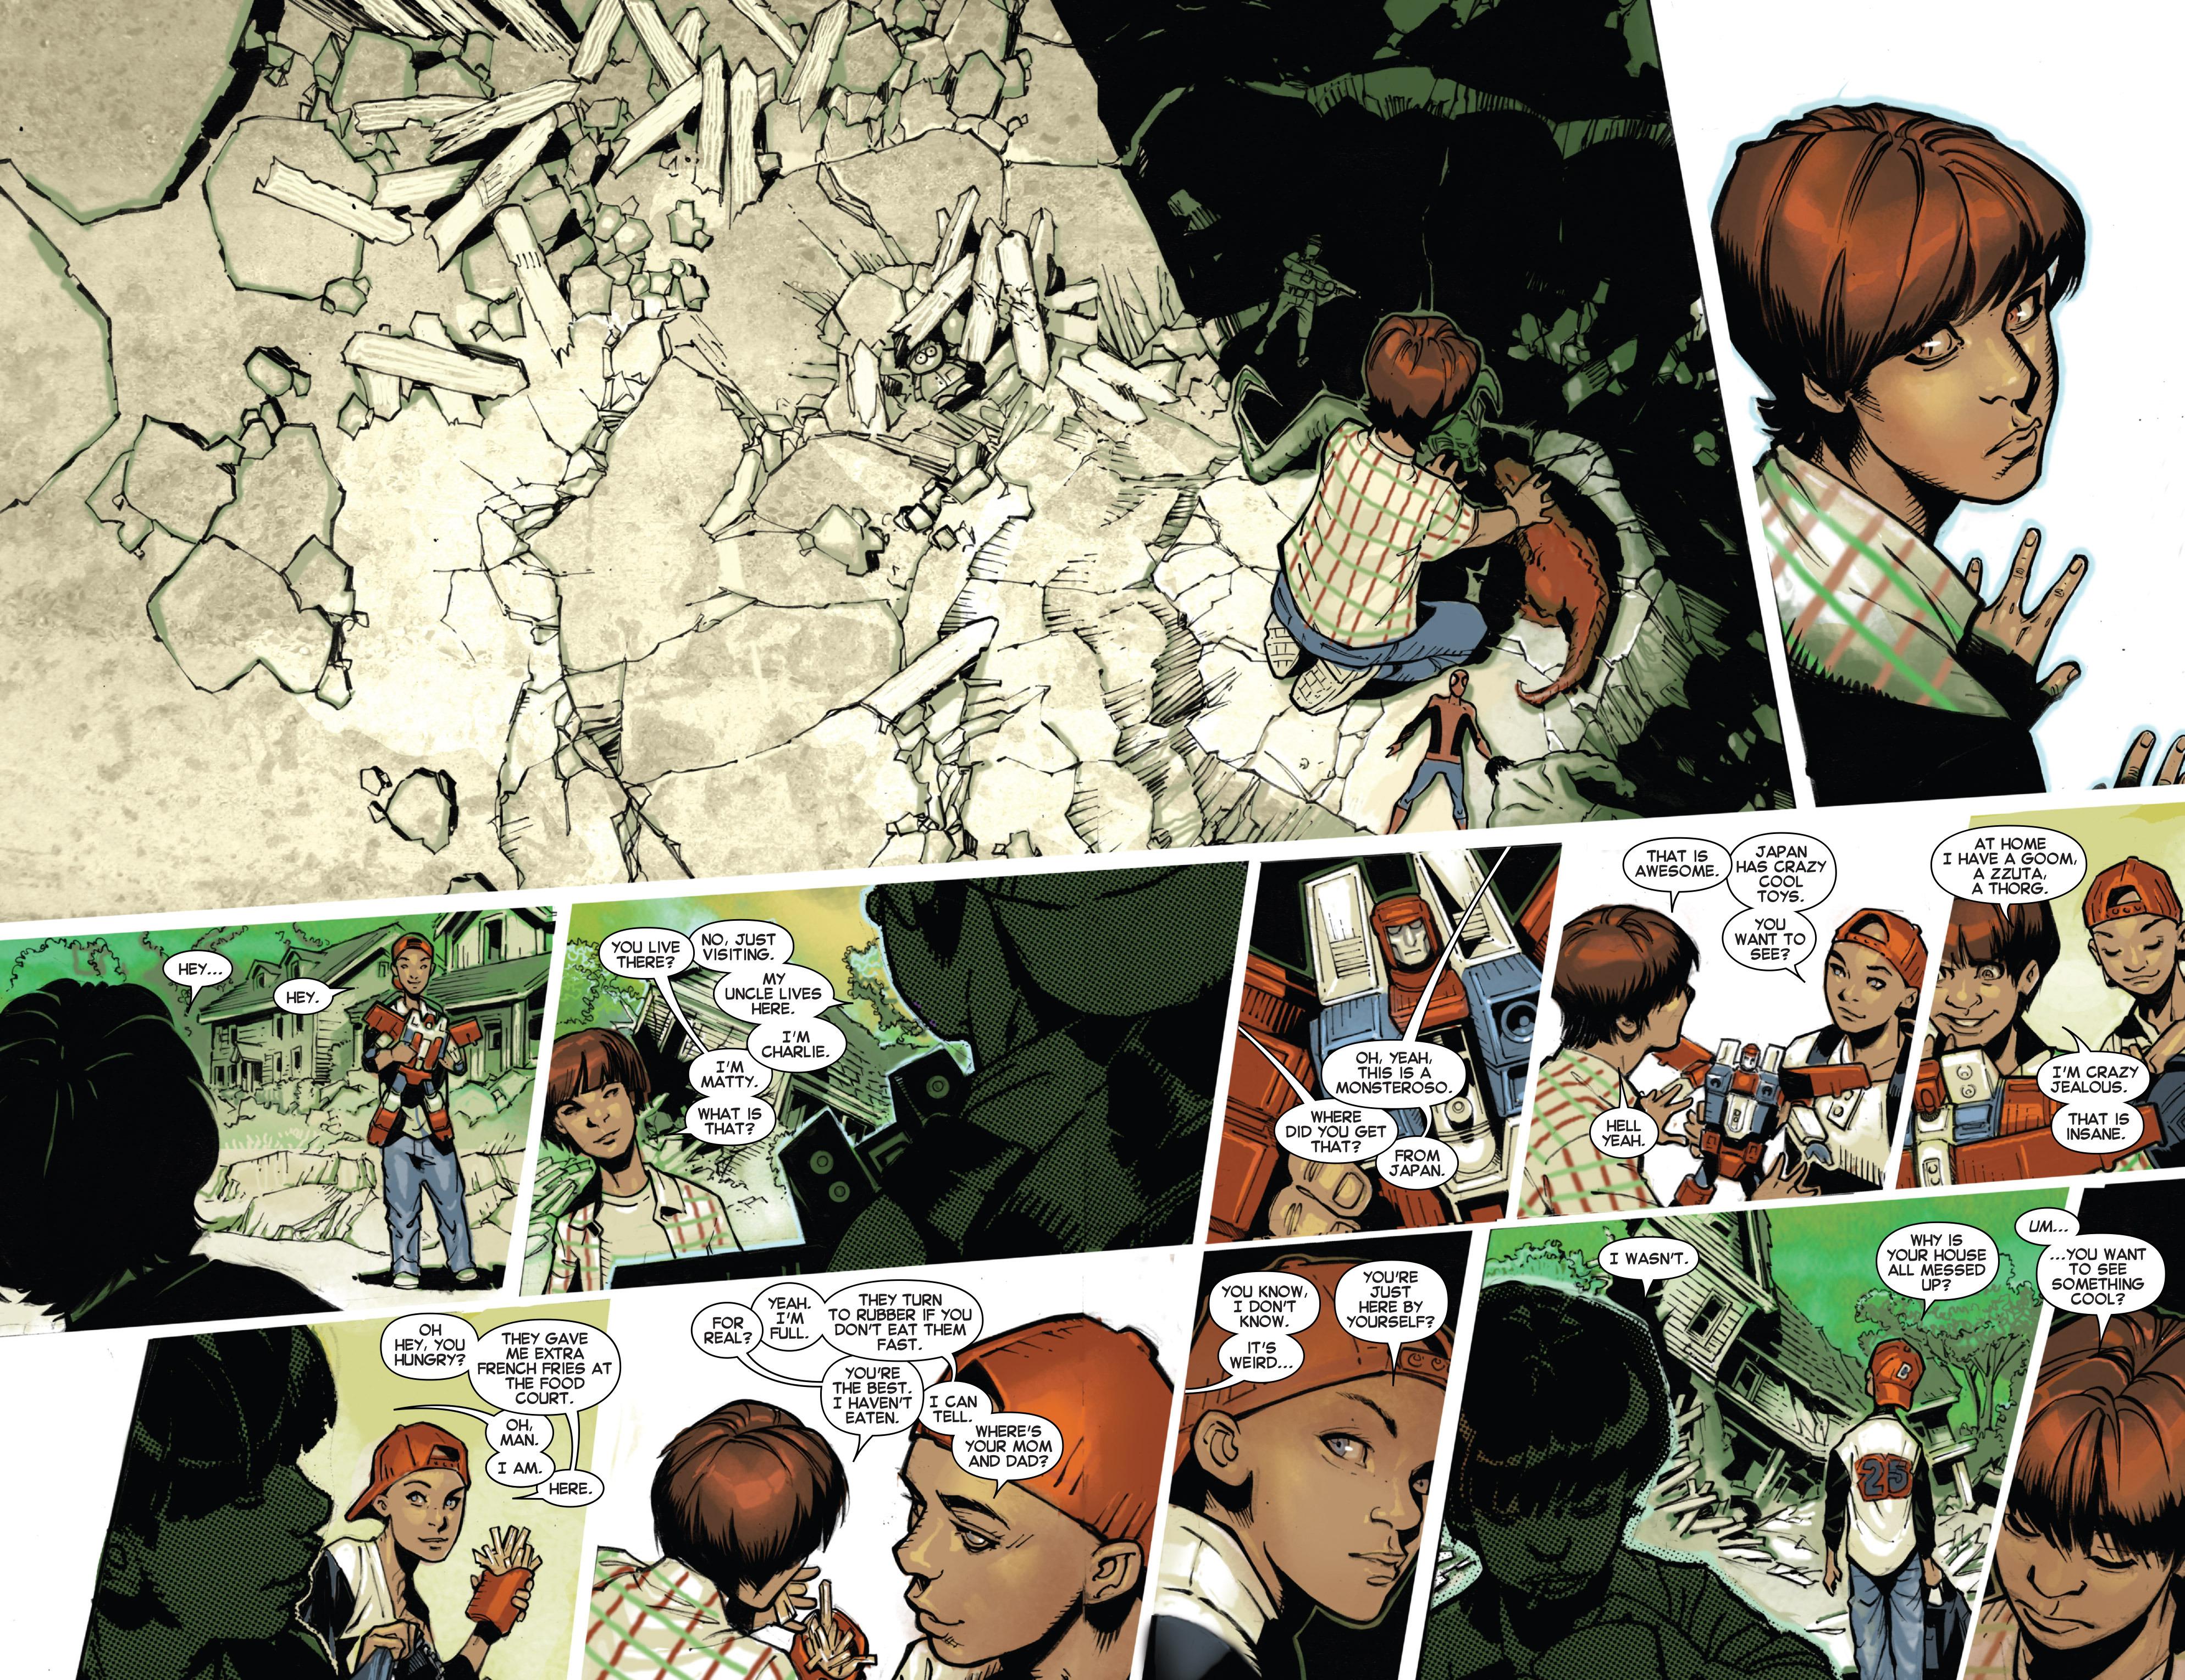 Read online Uncanny X-Men (2013) comic -  Issue # _TPB 4 - vs. S.H.I.E.L.D - 129